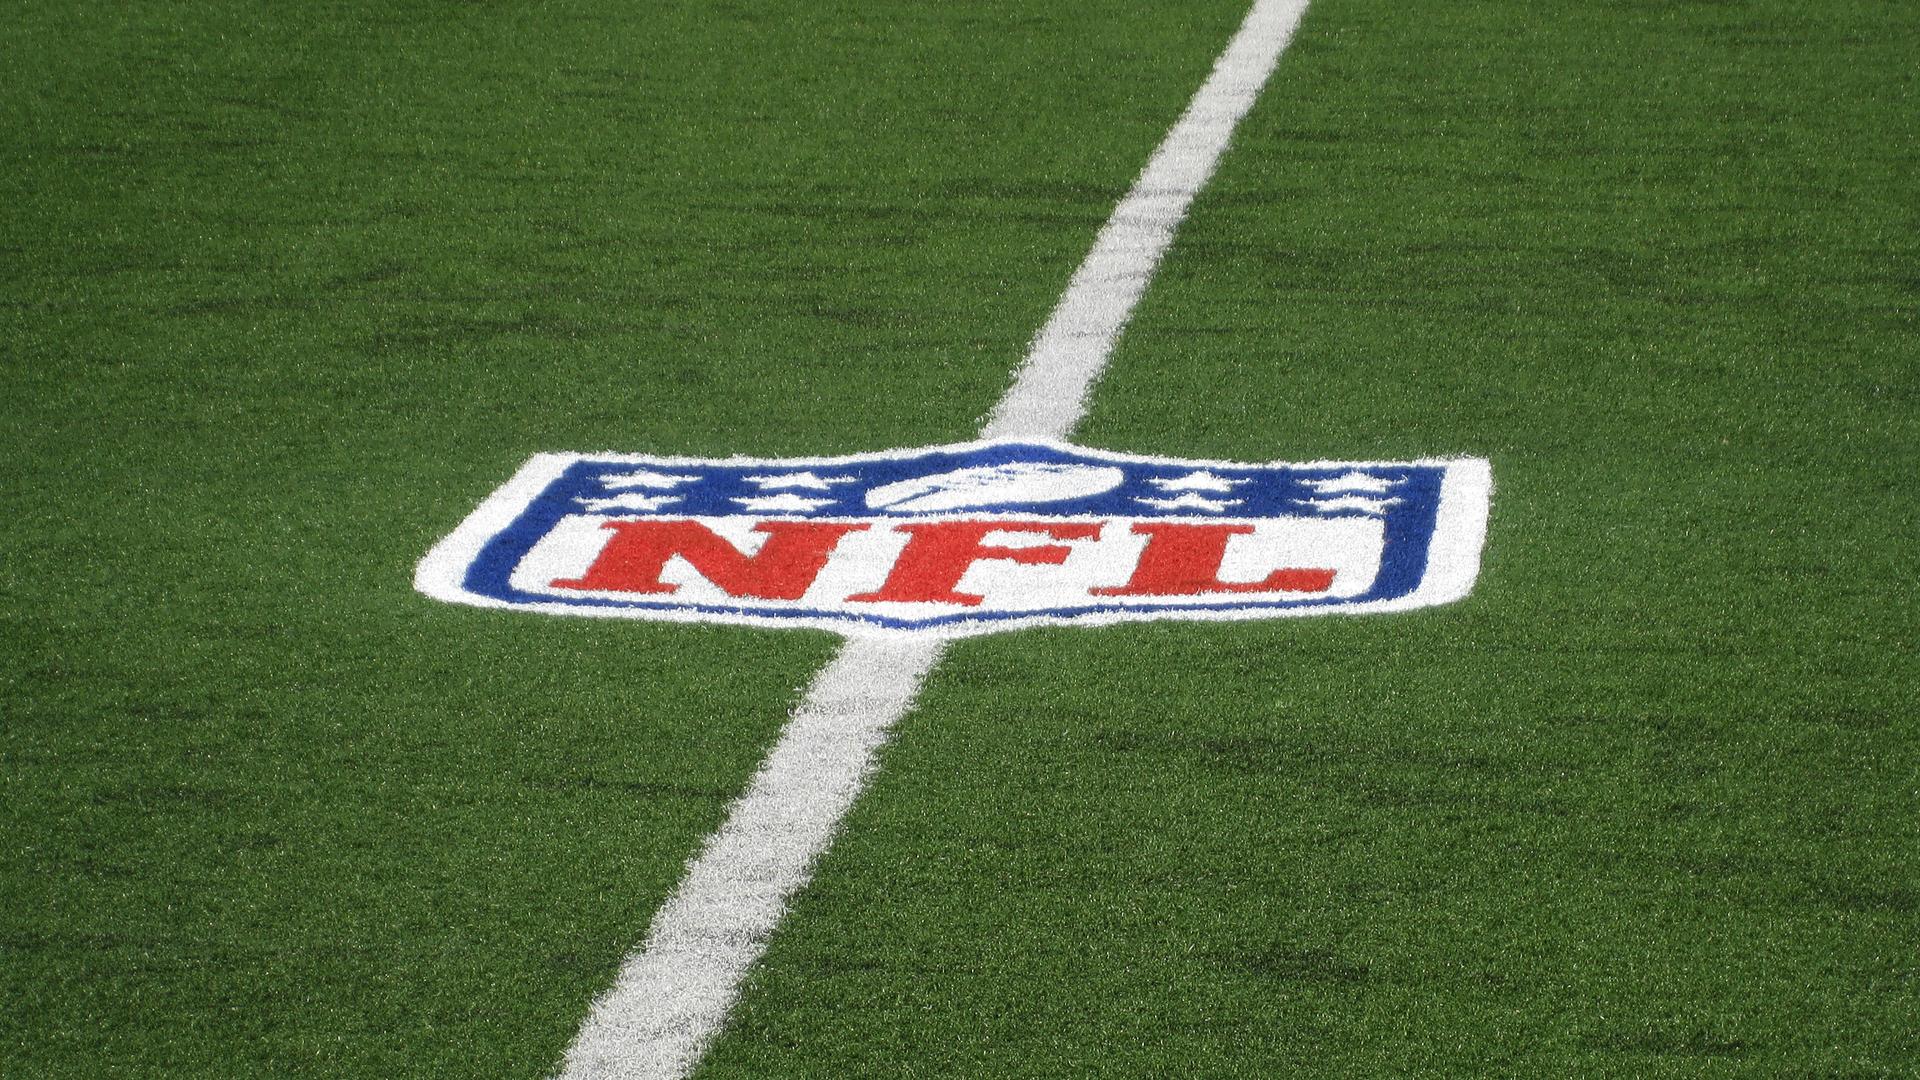 Nfl football field background imagenfl field logo hd sports football free 1600x1200px hd - Football field wallpaper hd ...